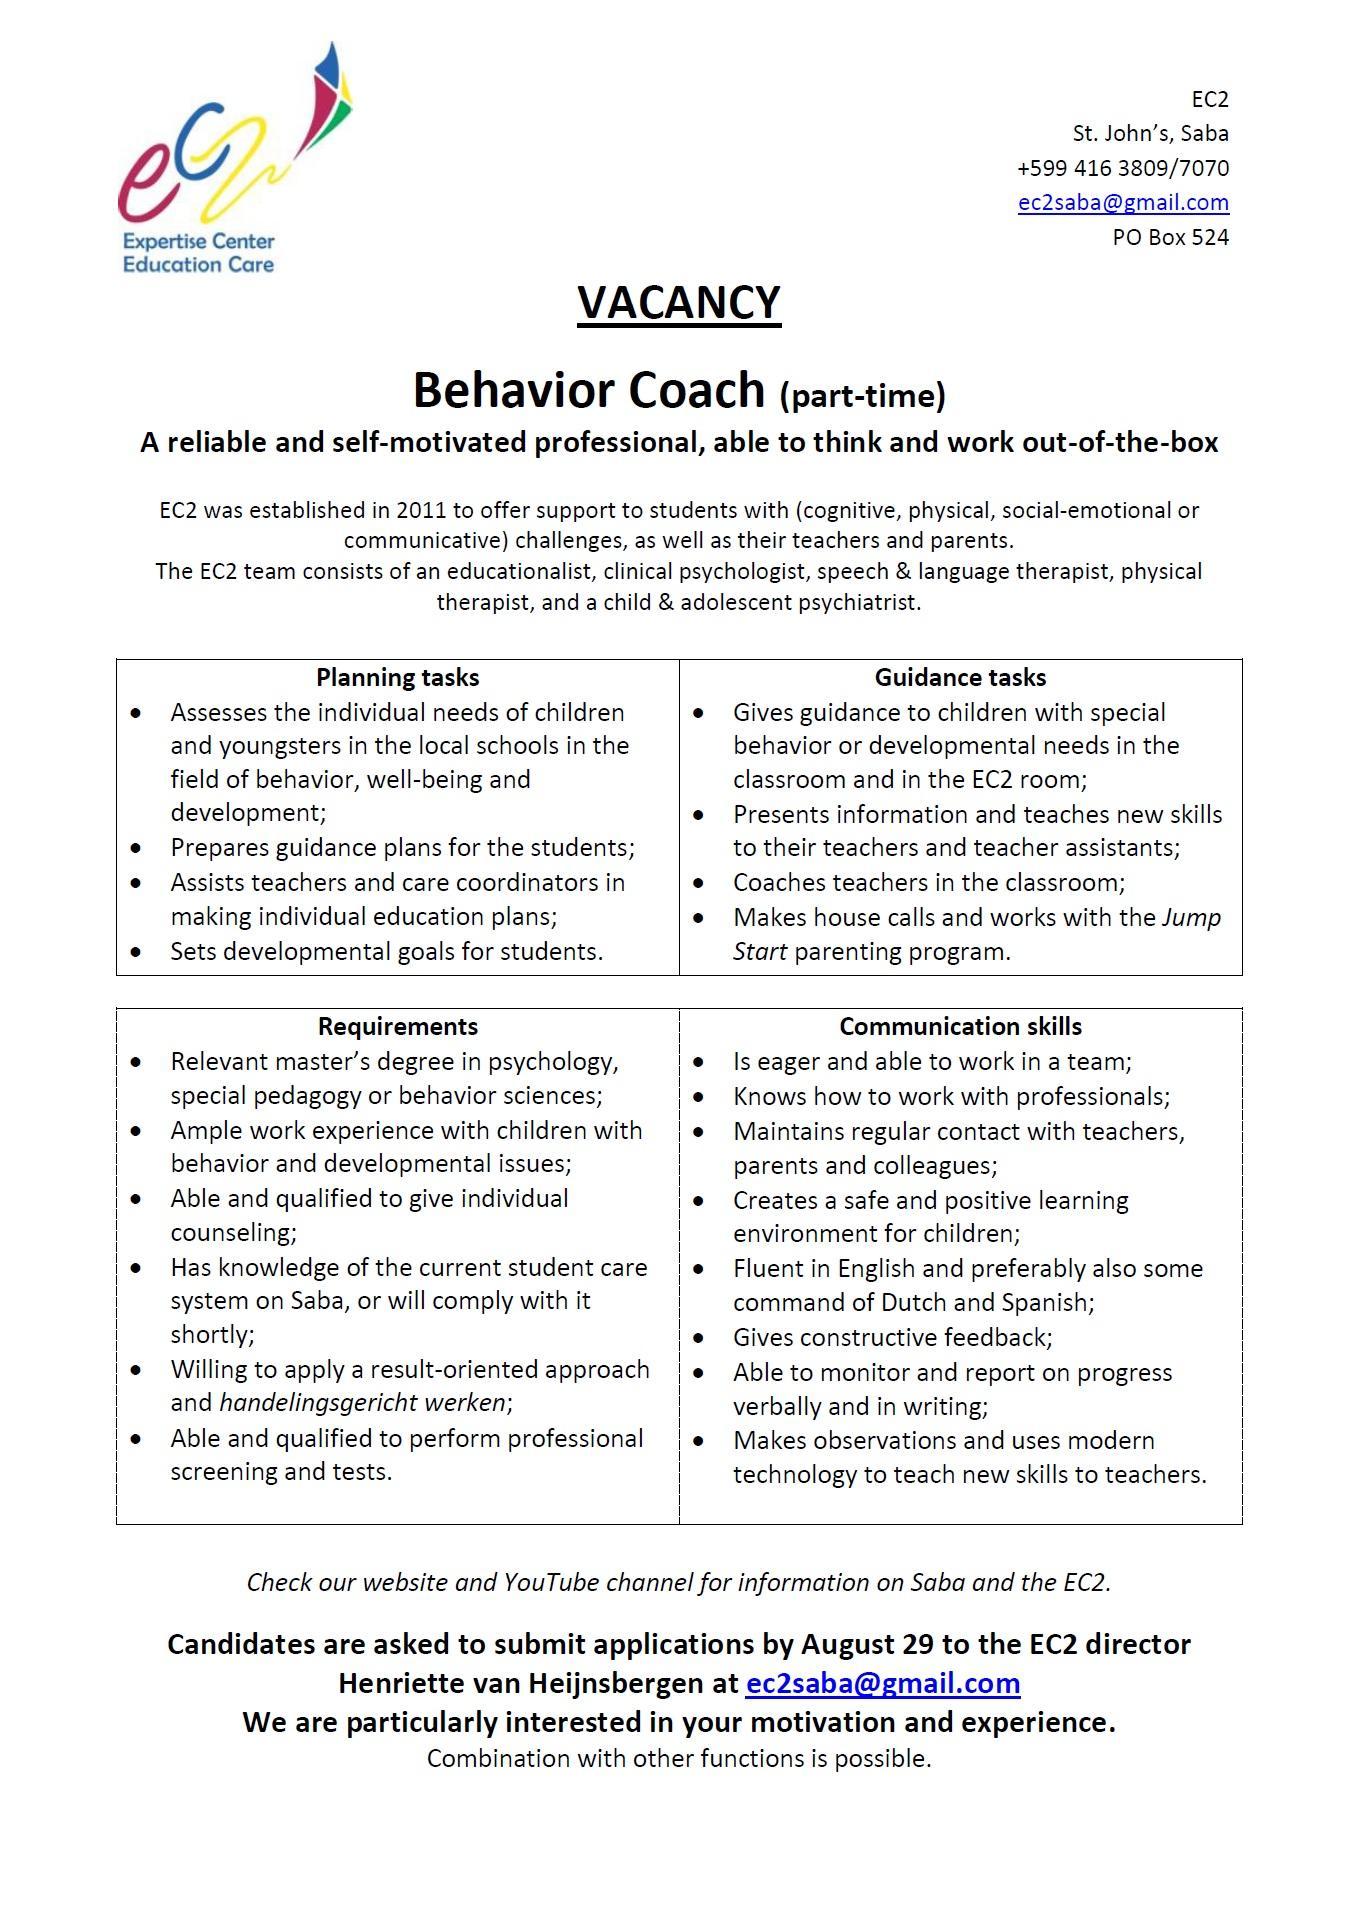 vacatures coaching en counseling